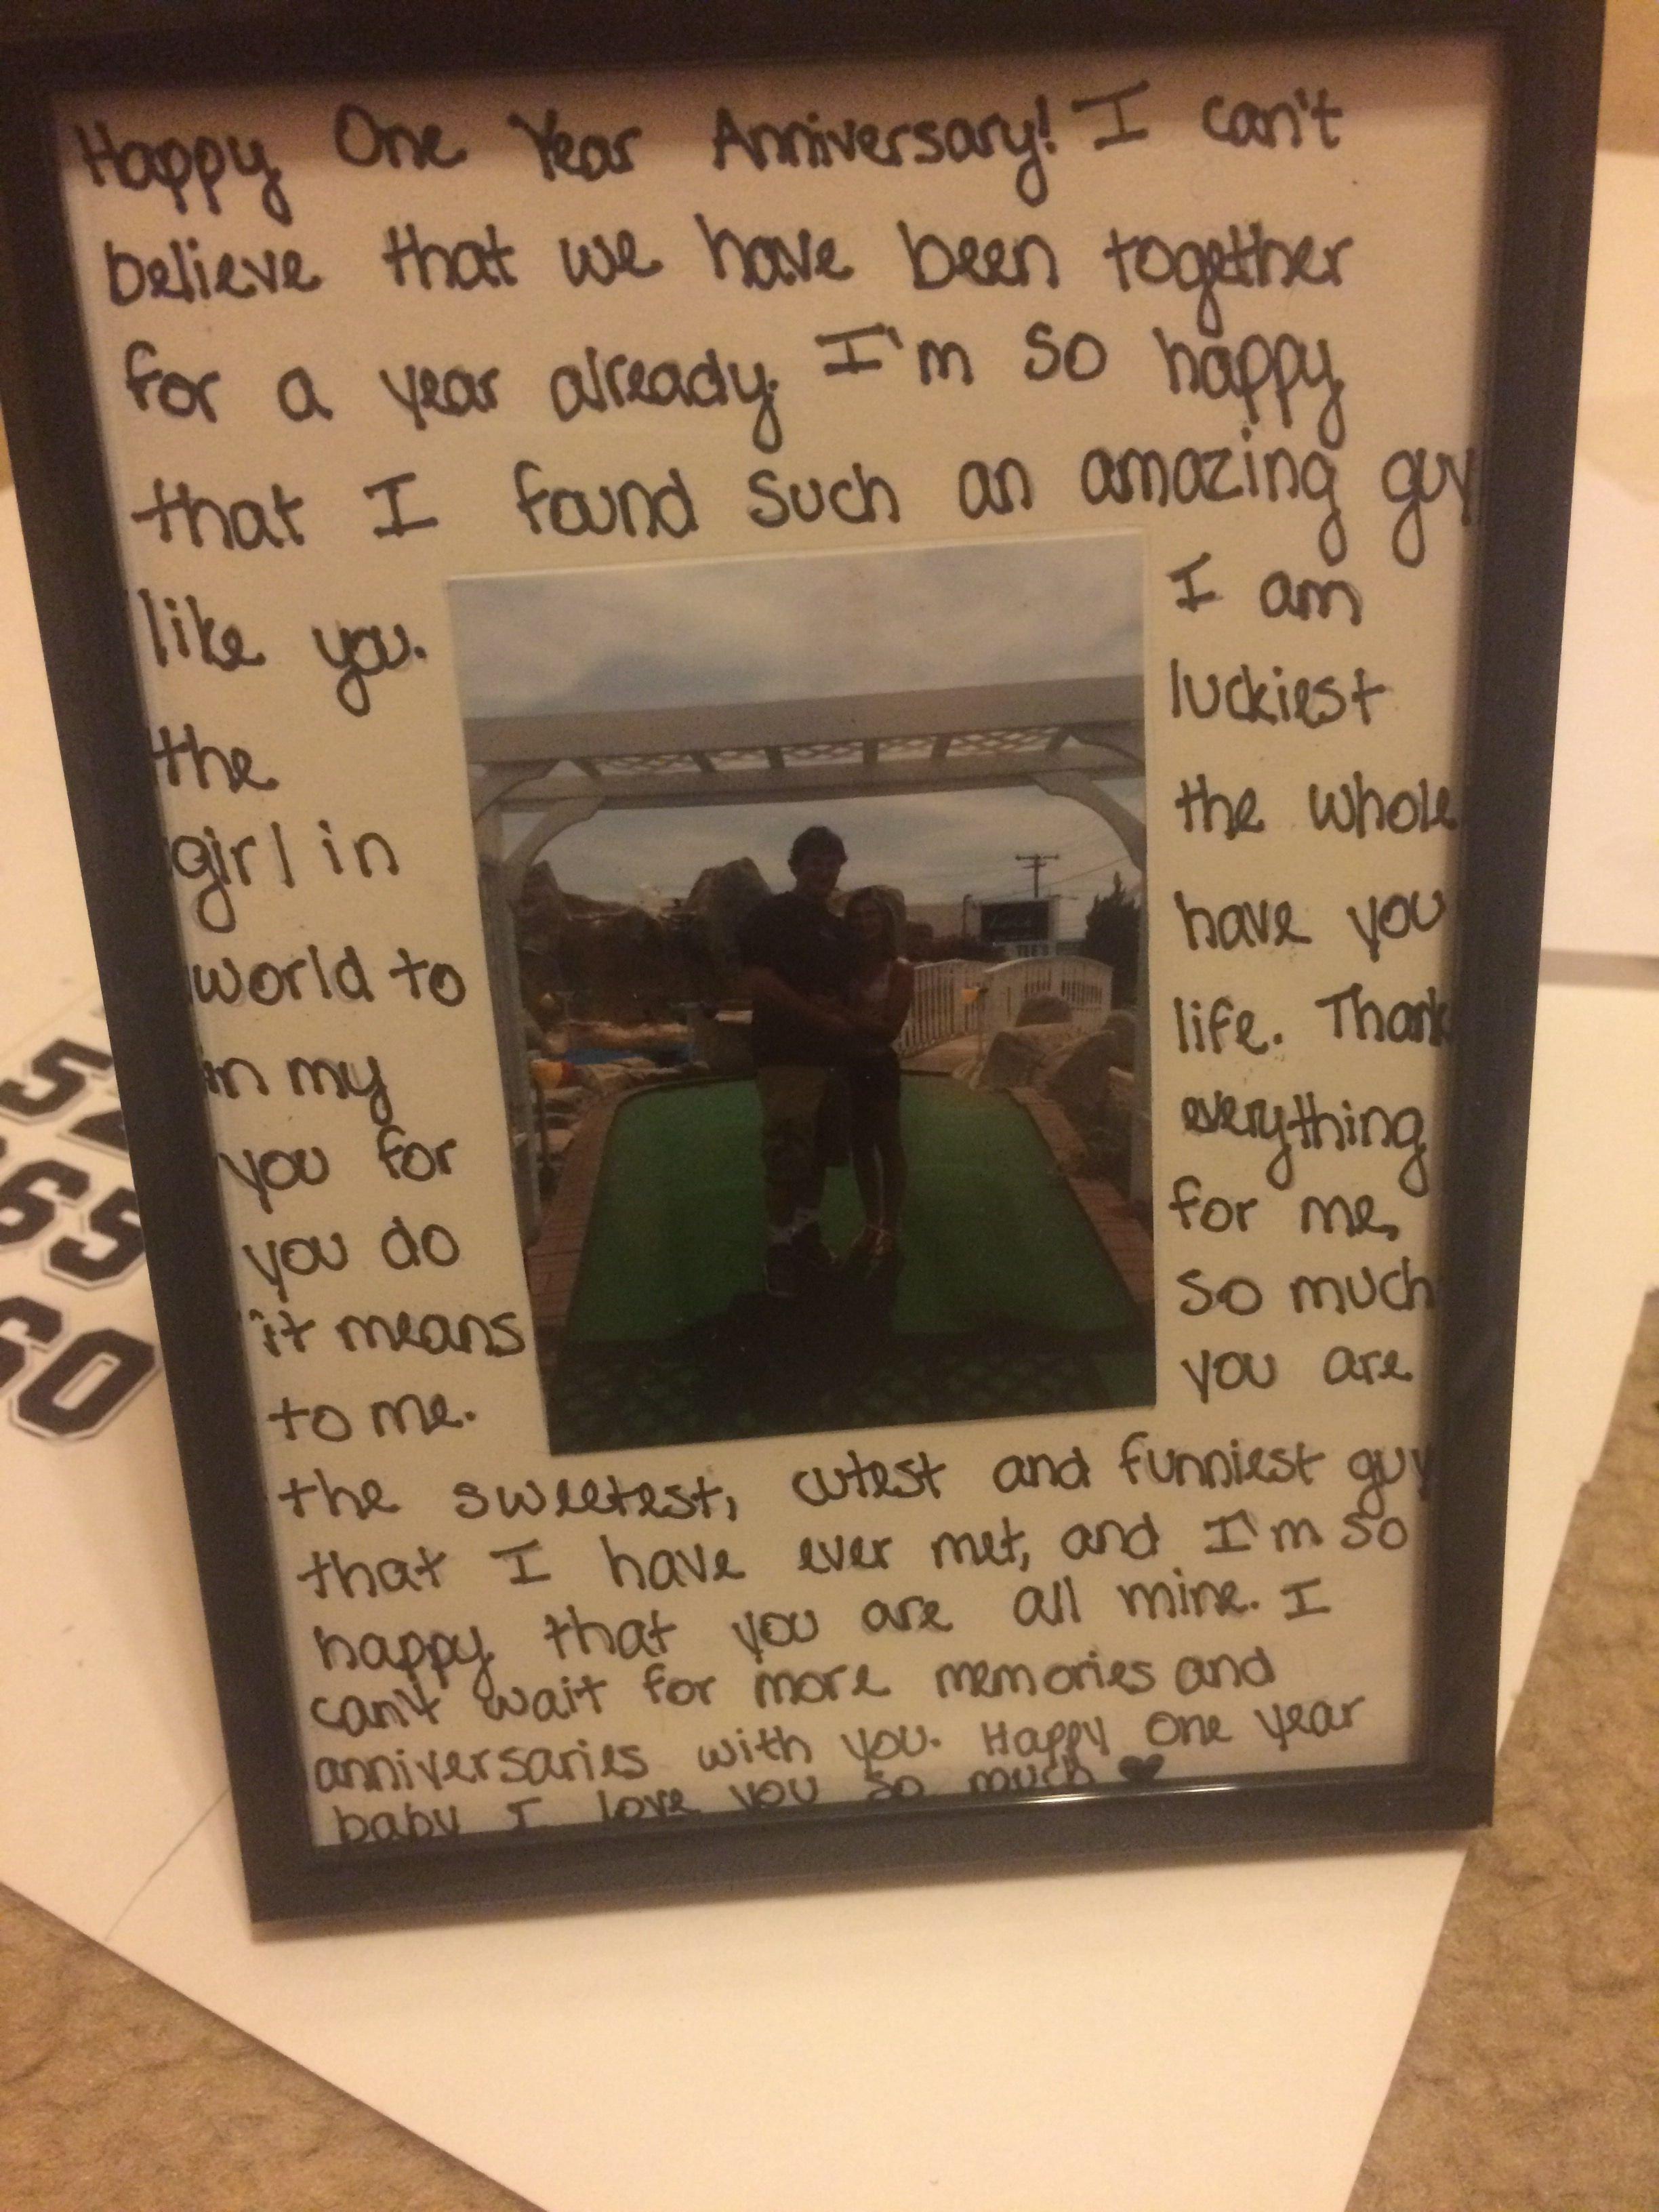 what to get boyfriend for 4 year anniversary